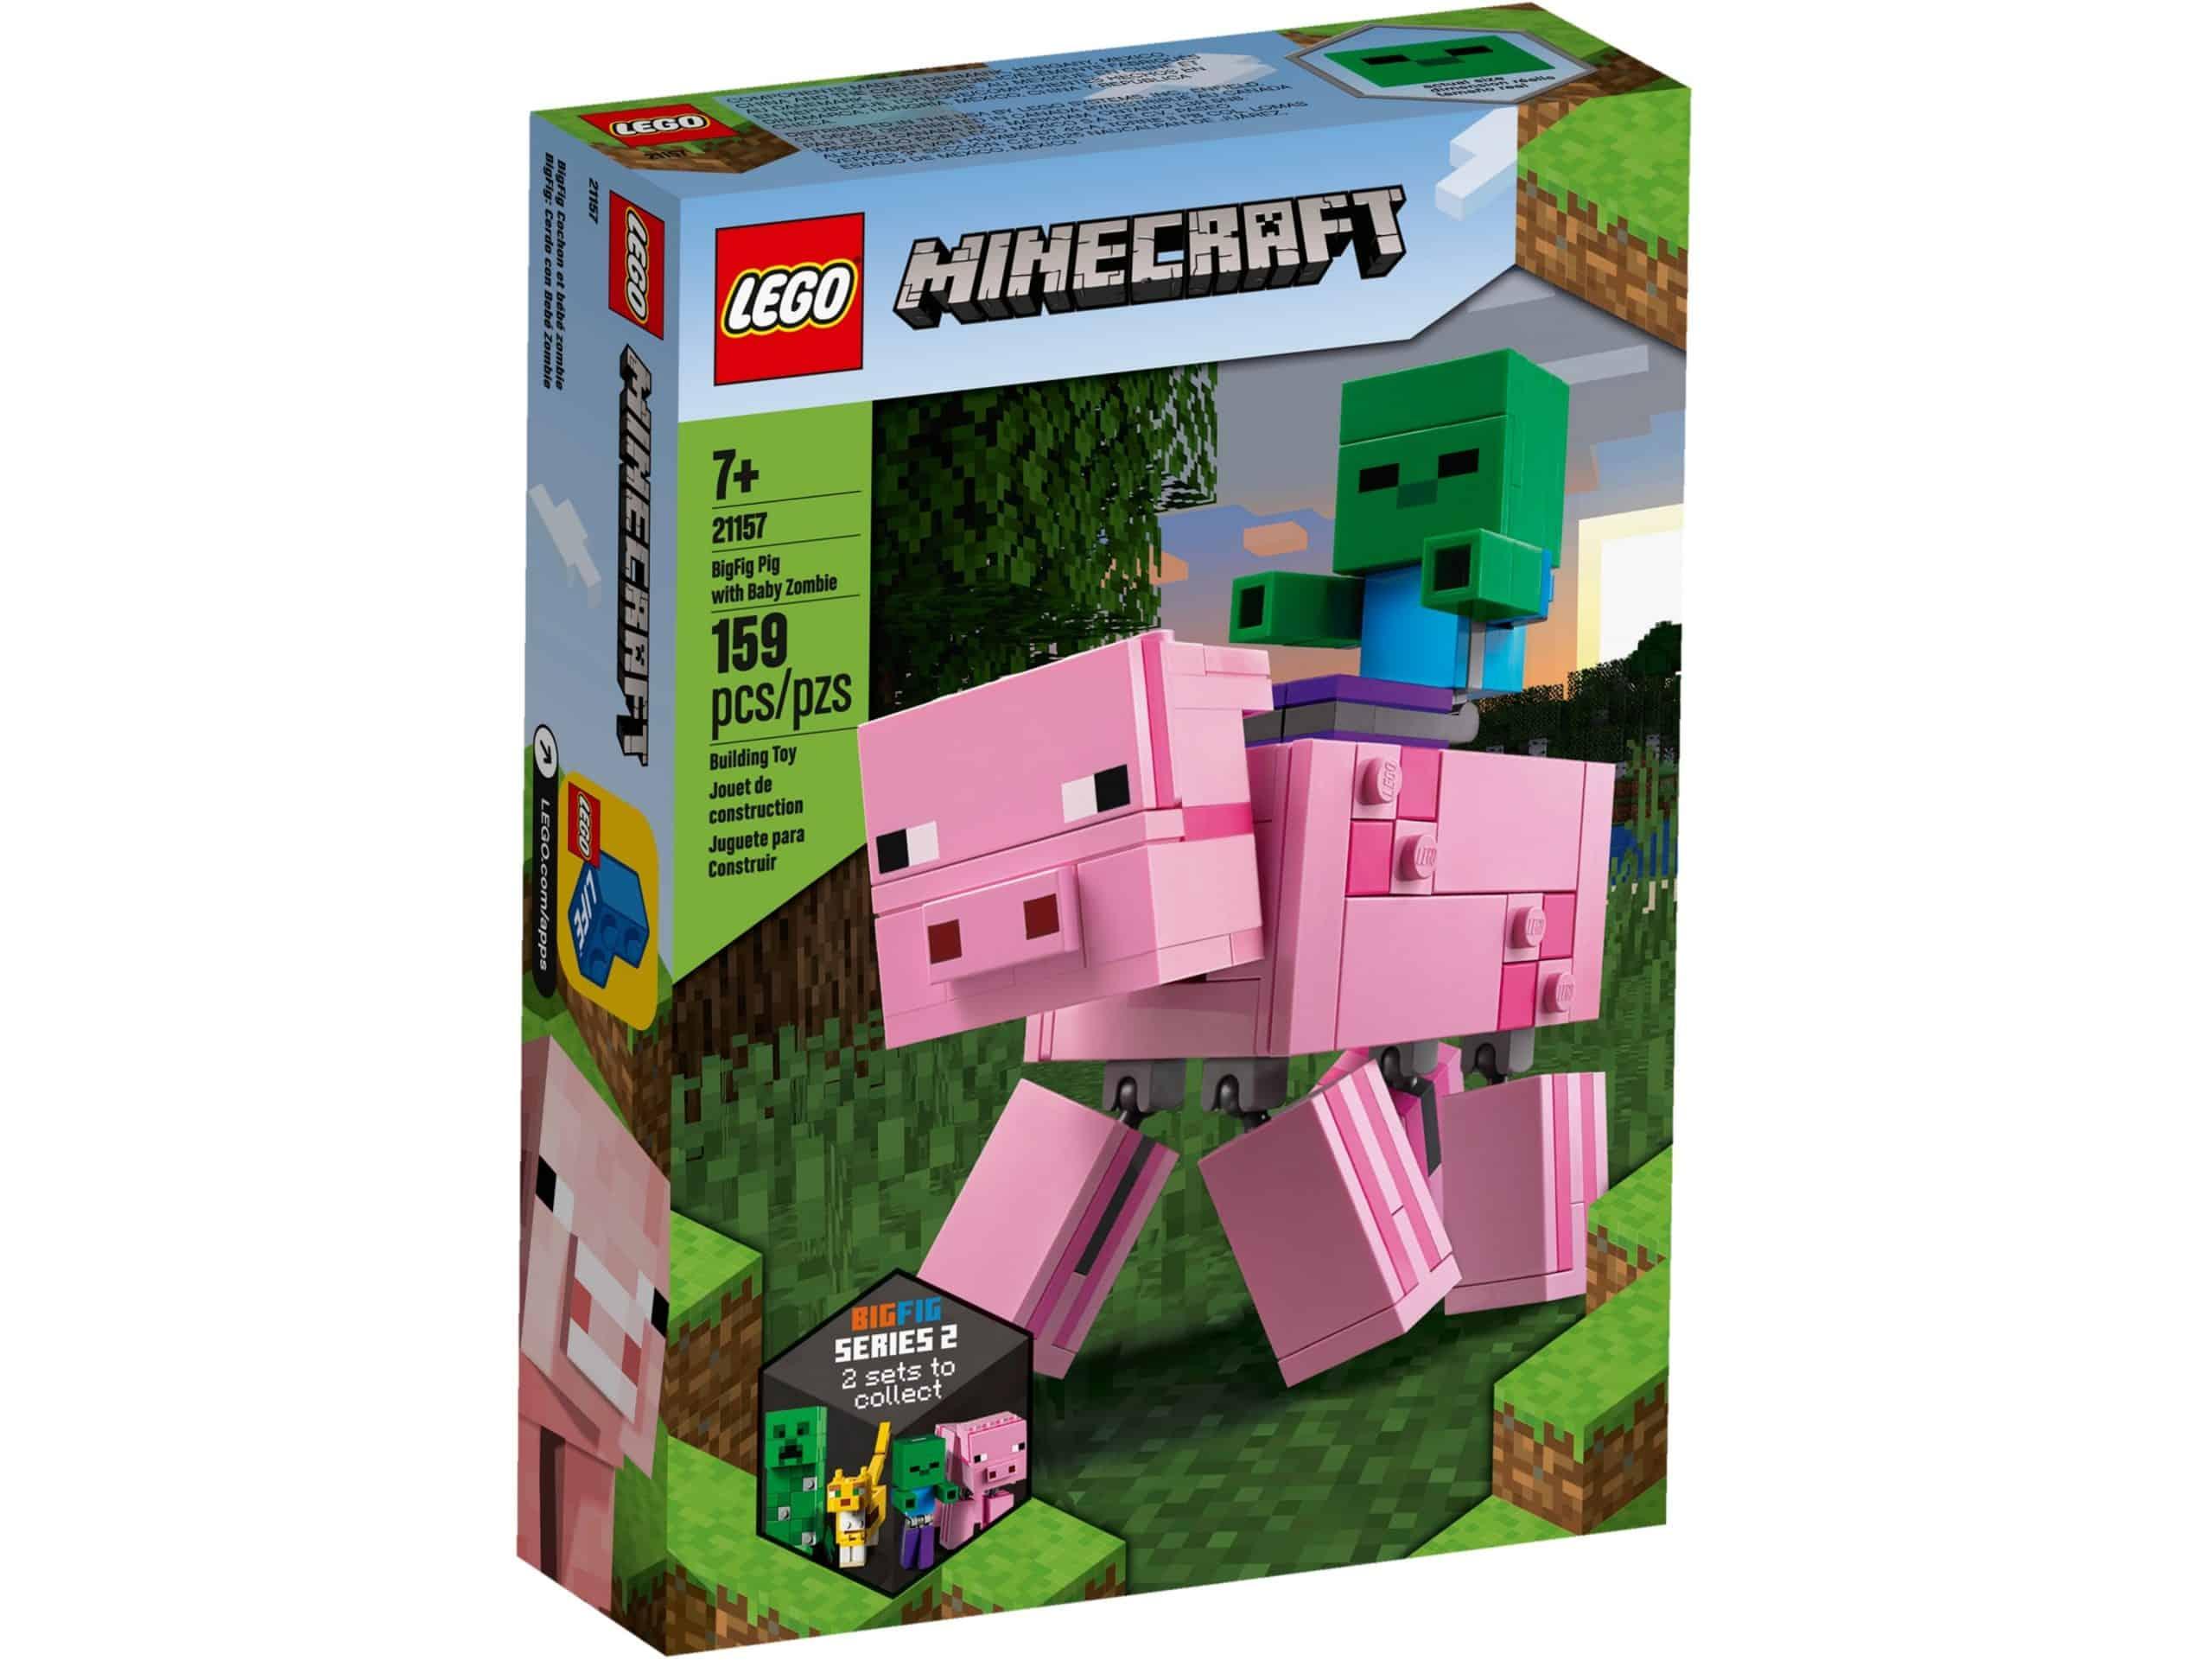 lego 21157 bigfig pig with baby zombie scaled